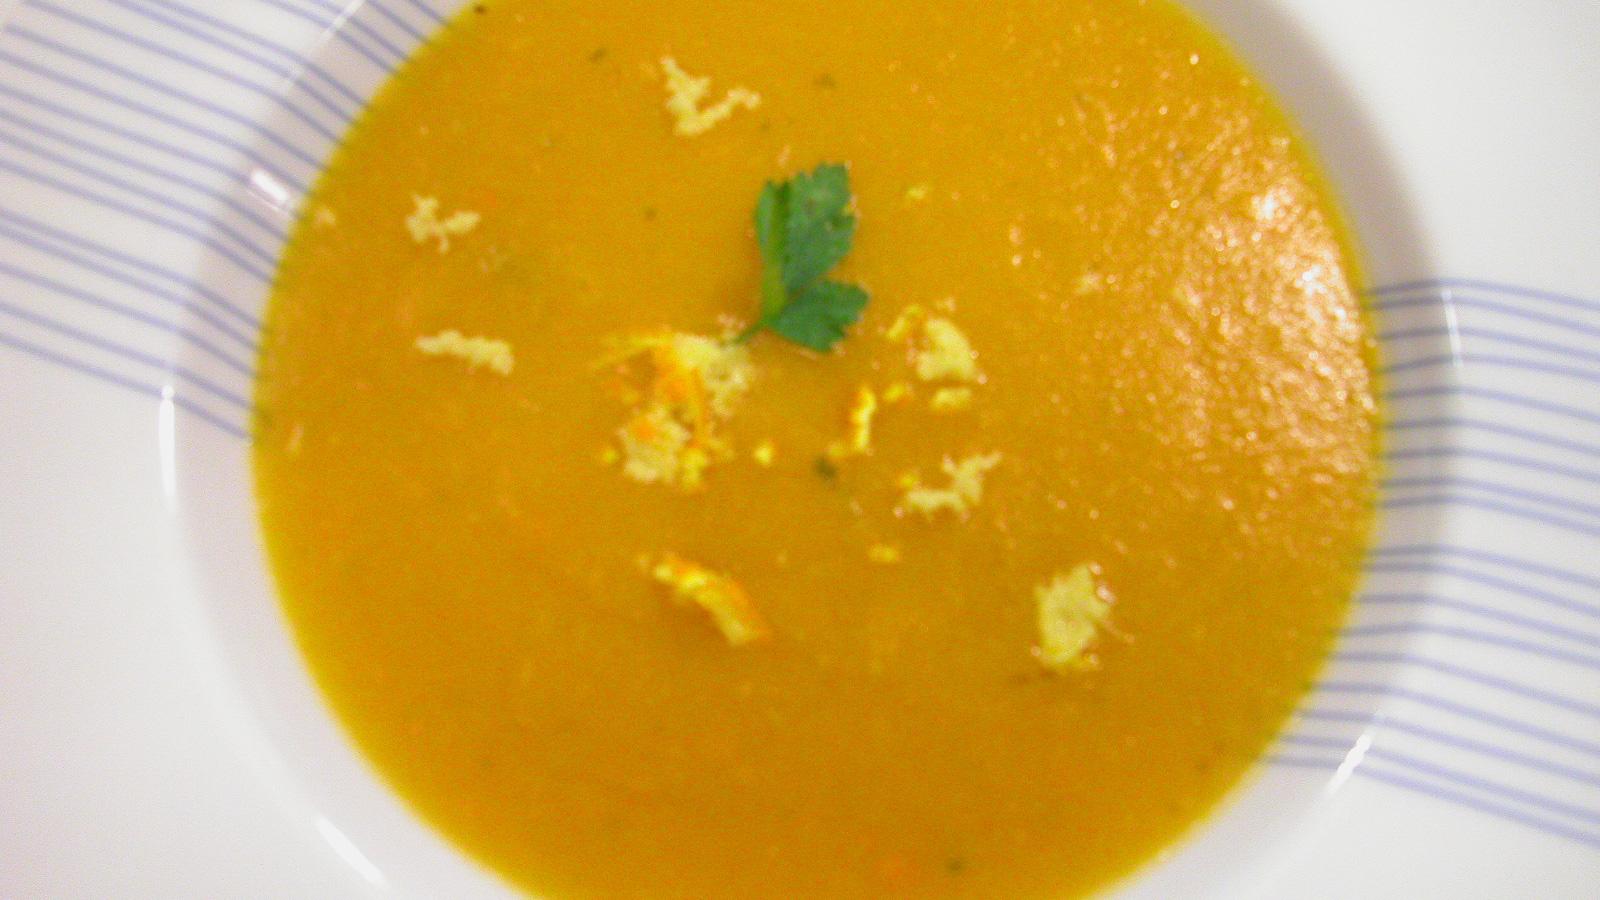 Cocina la receta Crema de zanahoria al jengibre de Marta Aranzadi